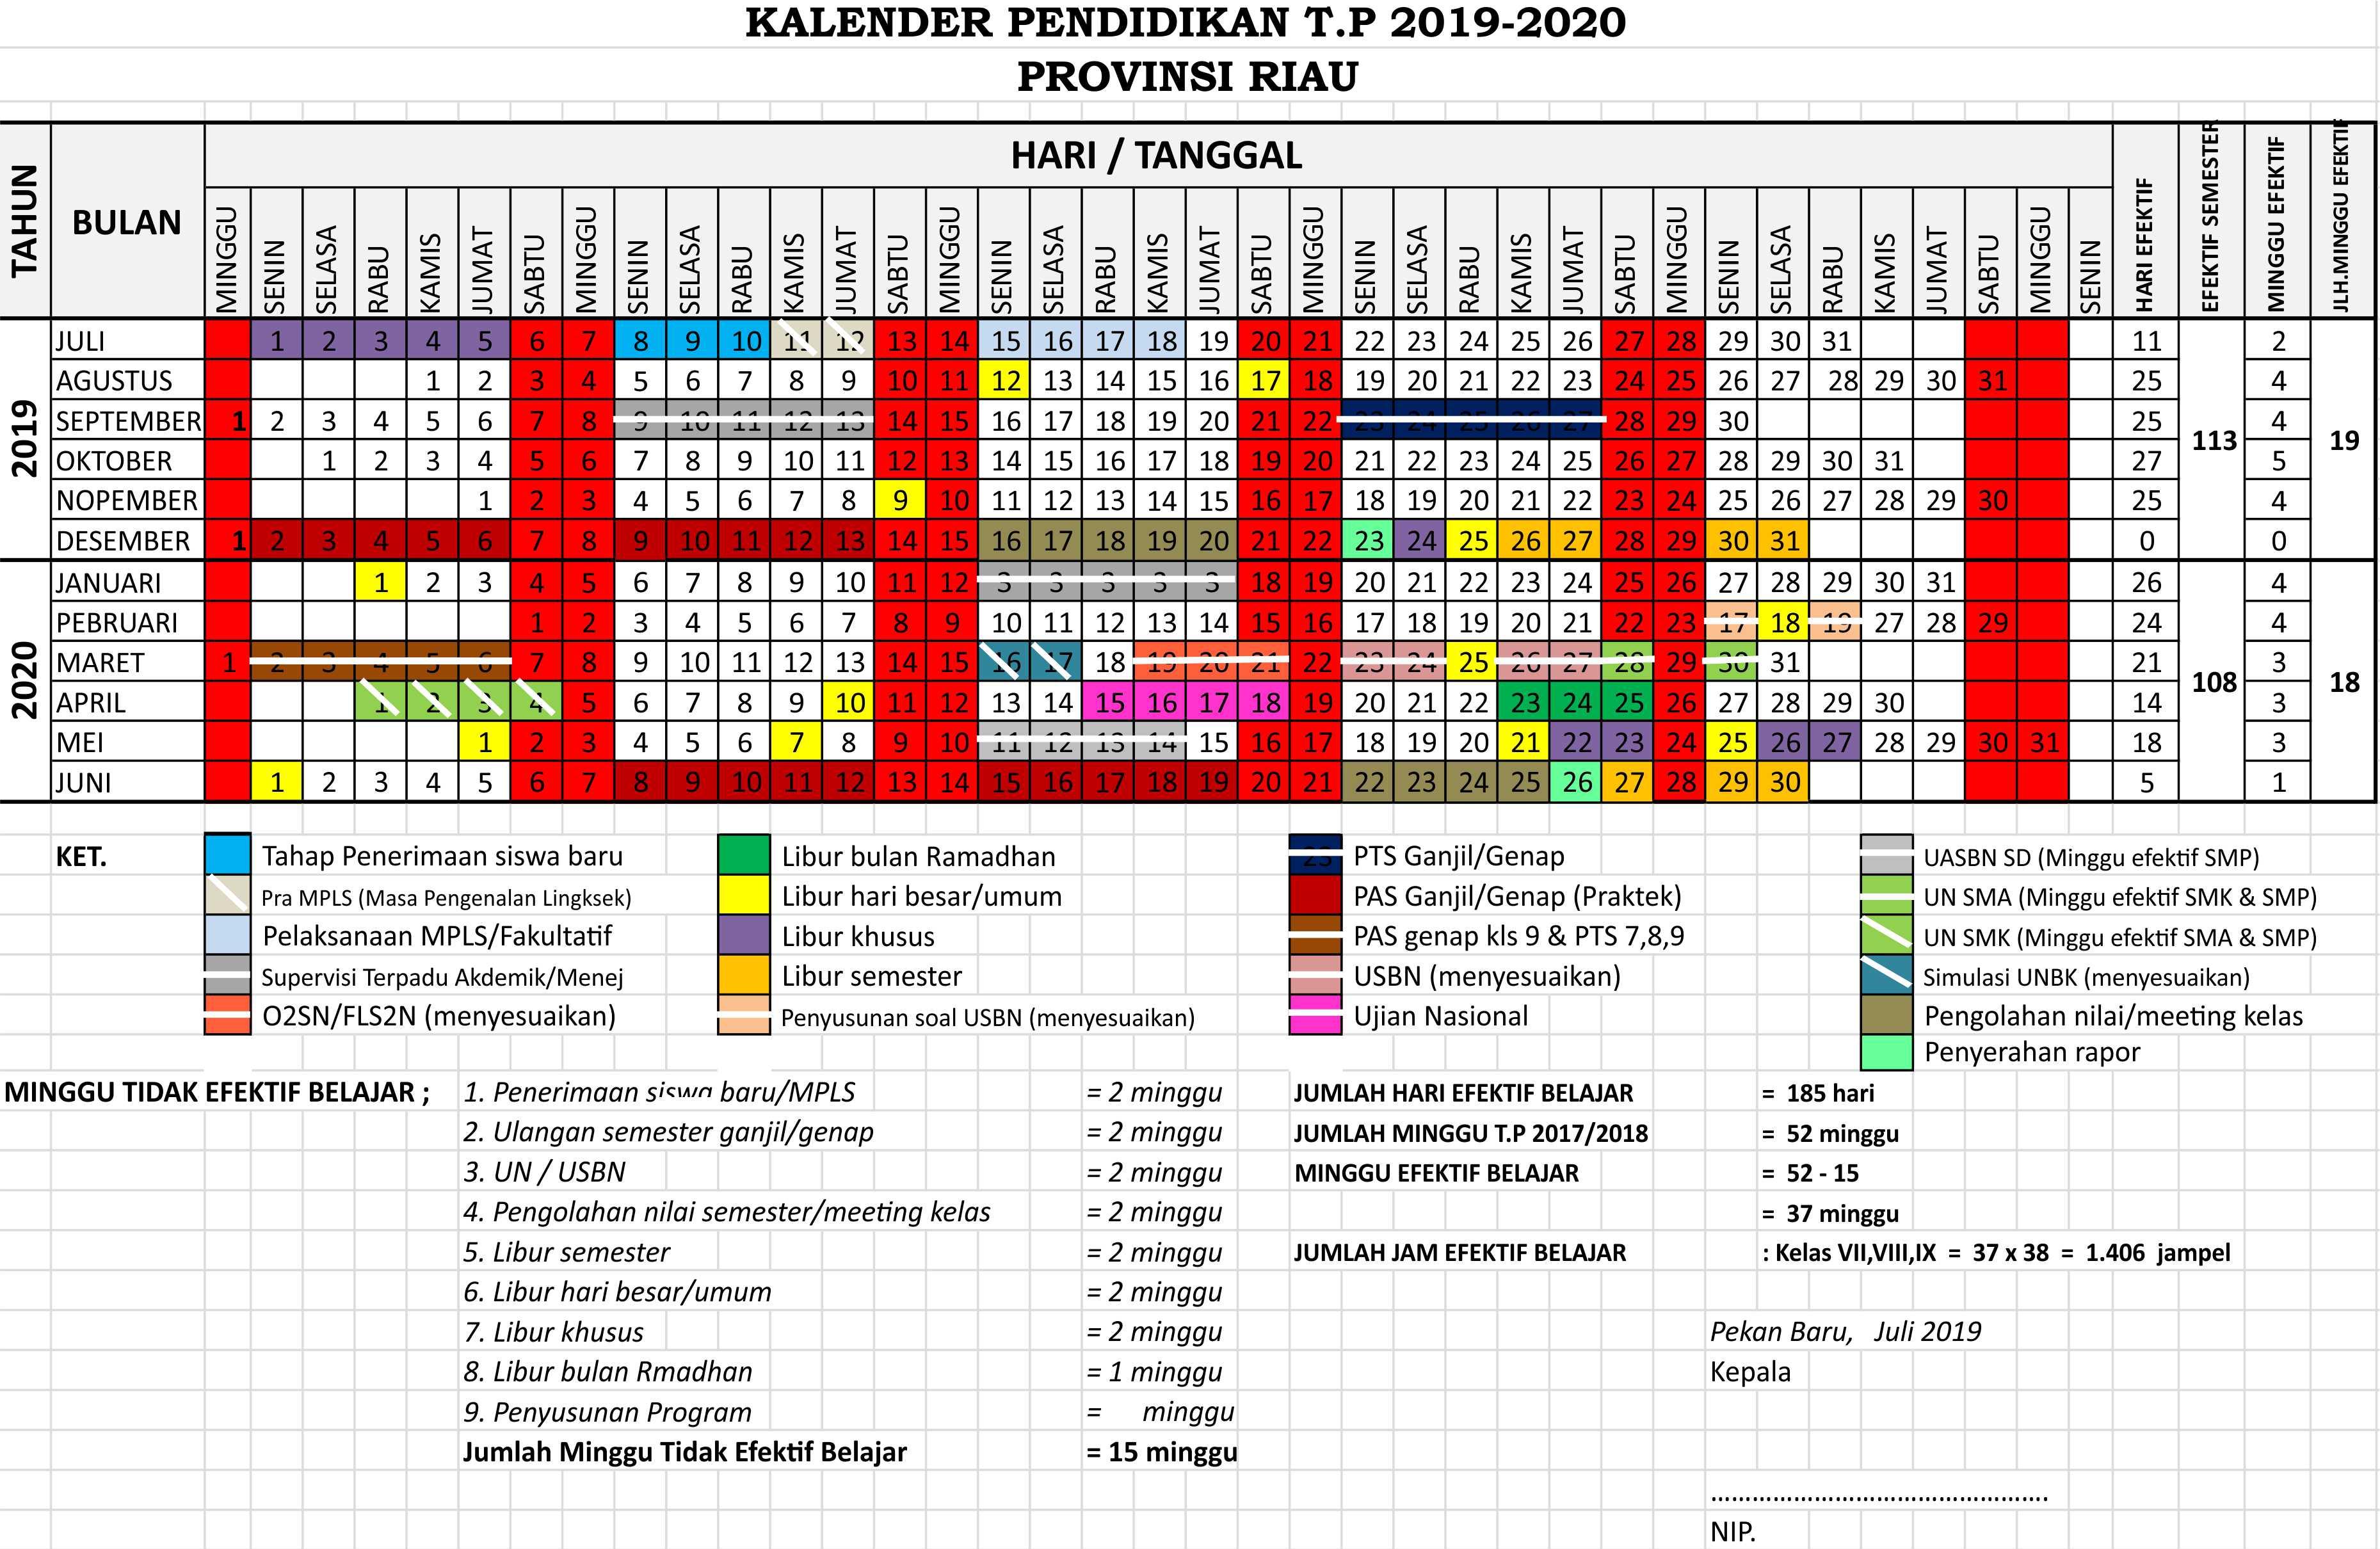 kalender pendidikan pekan baru provinsi riau 2019 - 2020